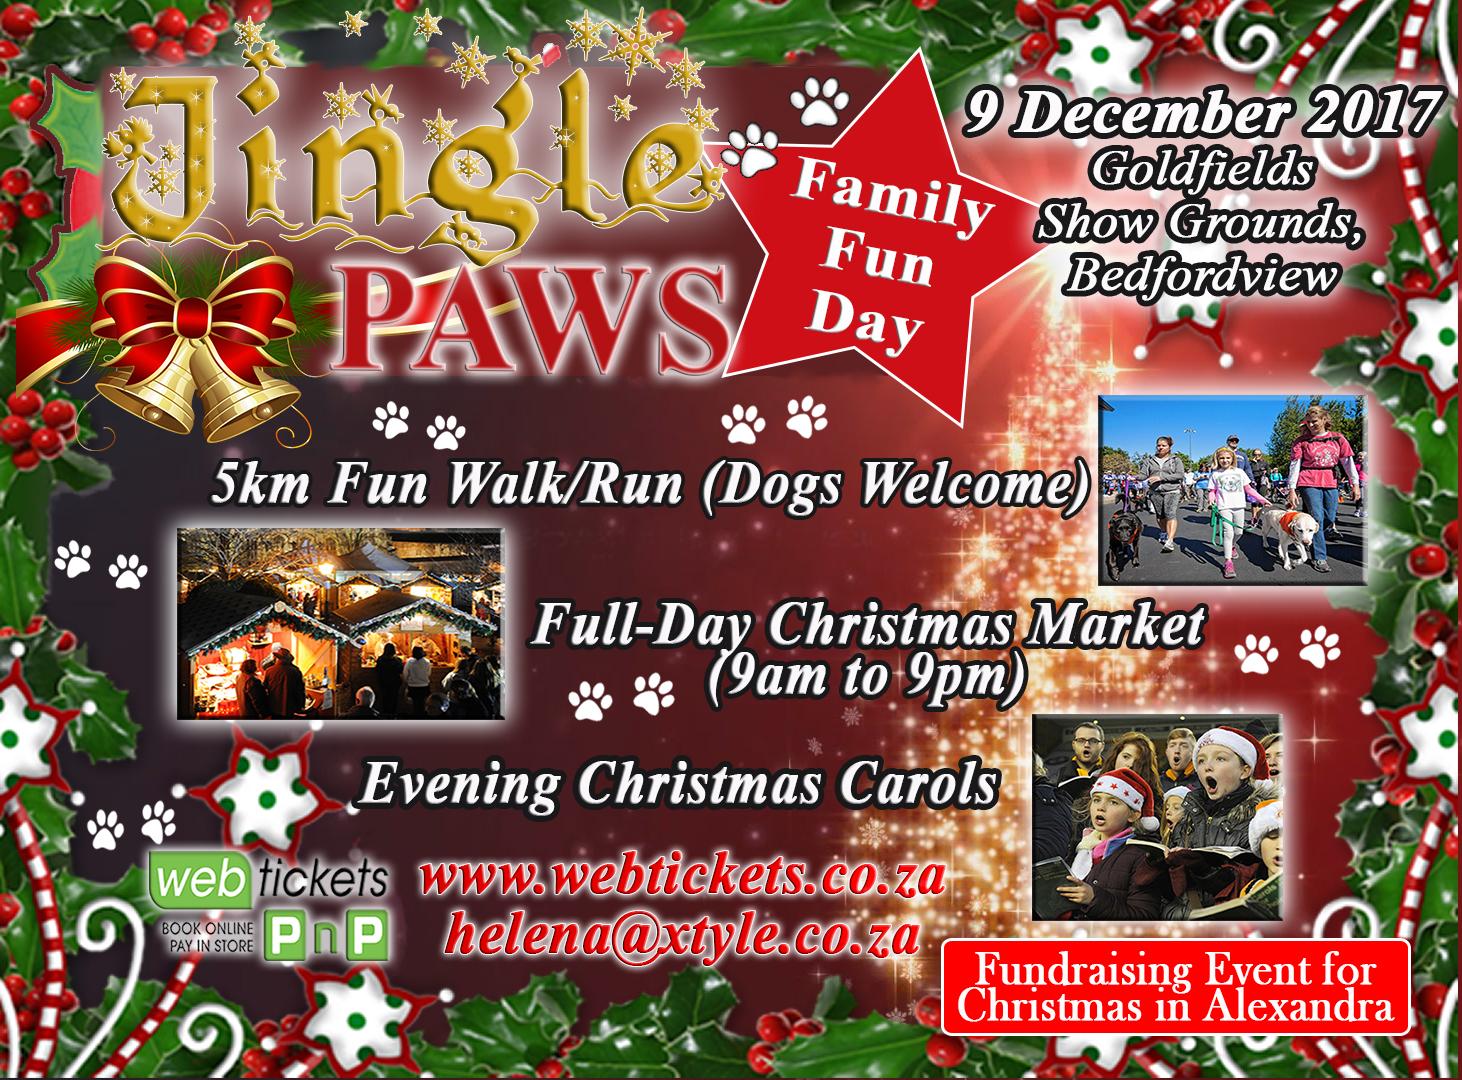 Fun Walk with Animals, Christmas Market and Christmas Carols